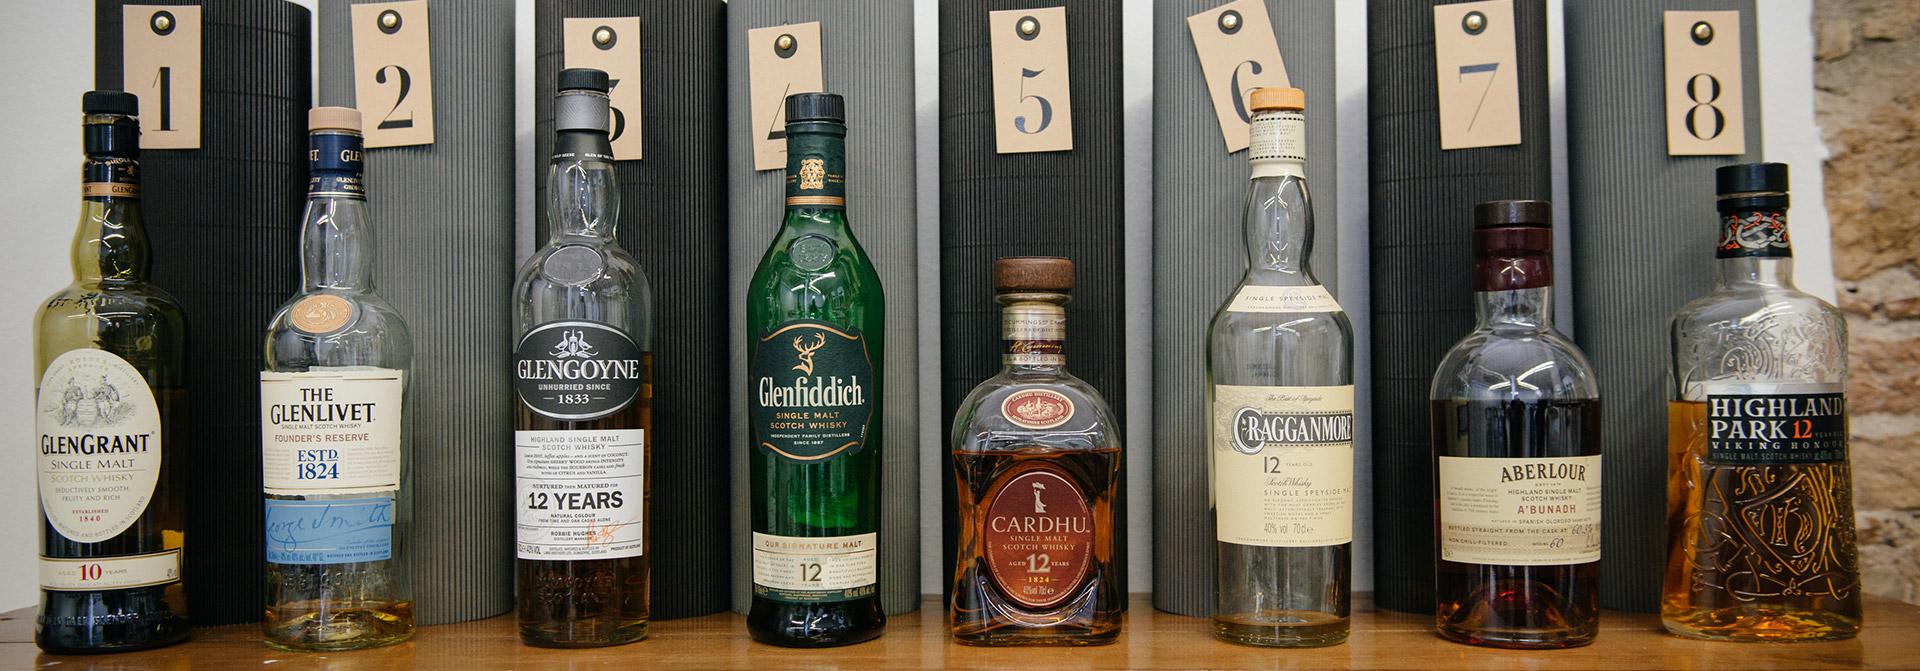 the tasters club whisky tasting day impact hub ουισκι